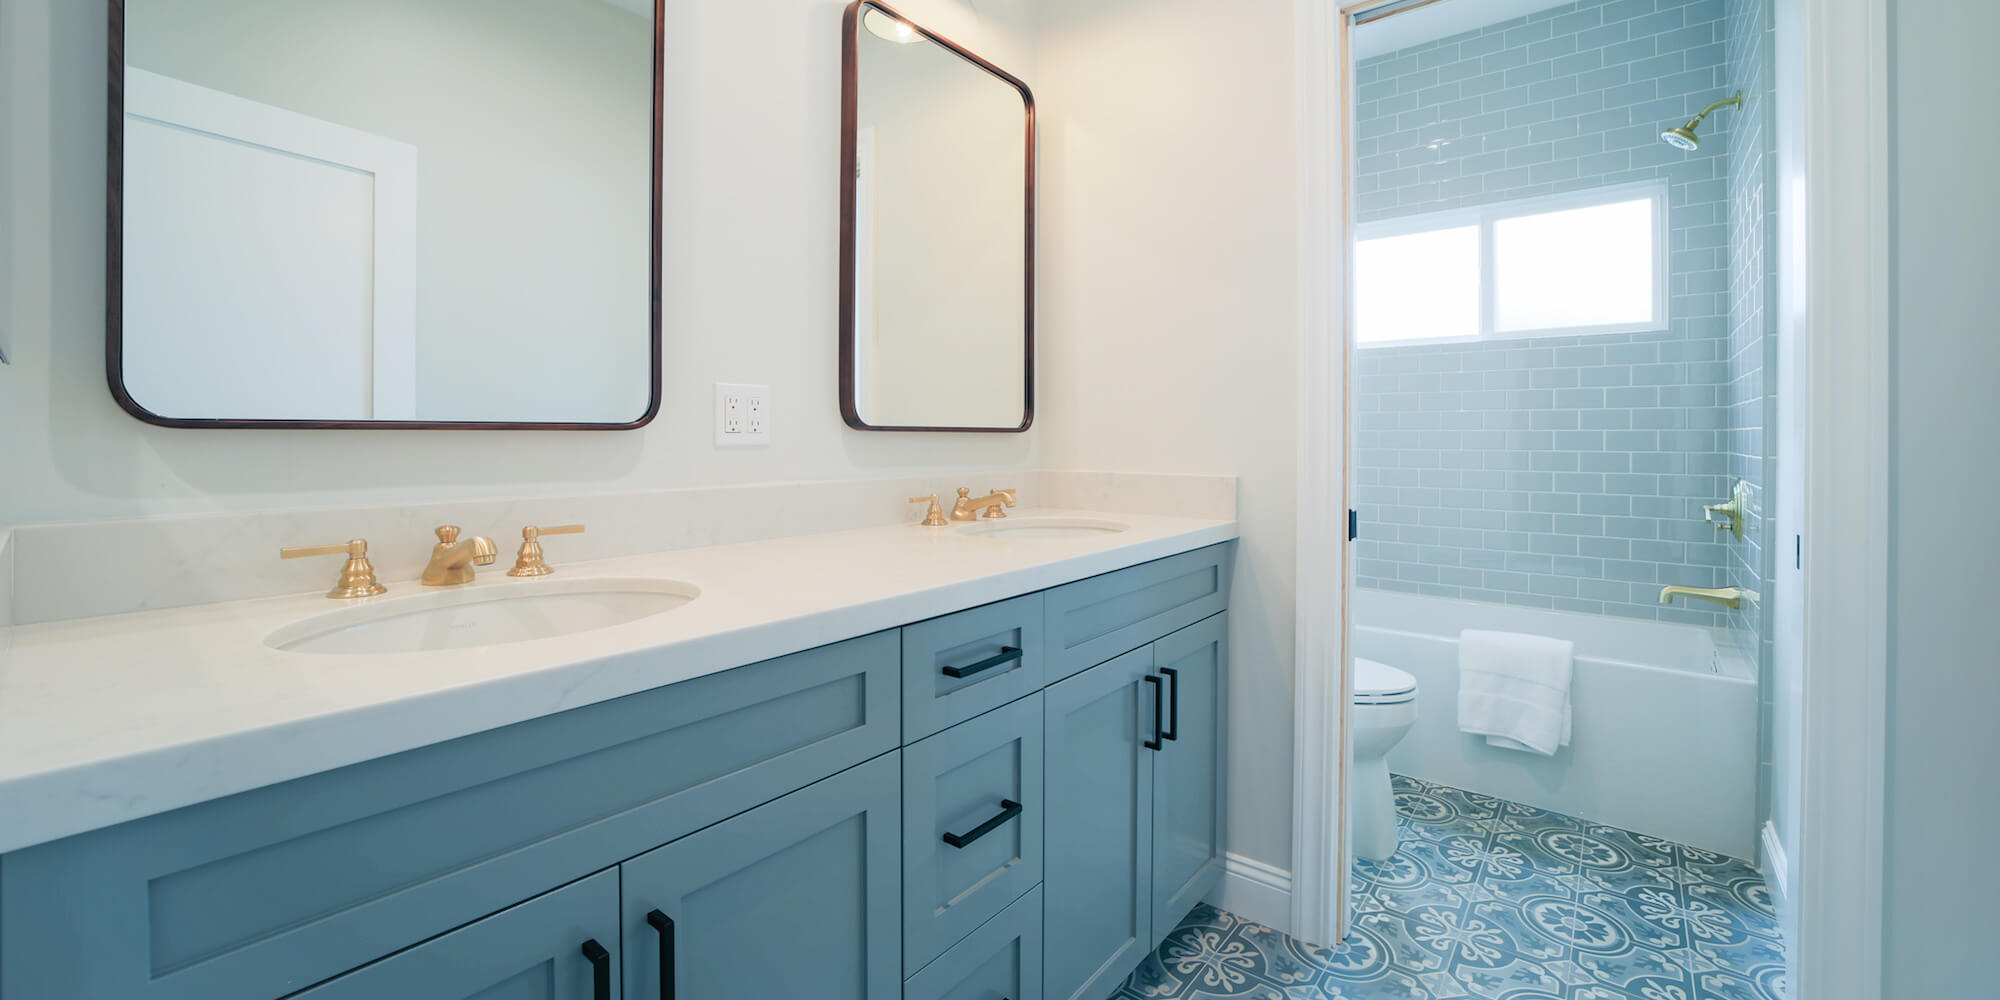 San Diego Design Build Remodel | Murray Lampert